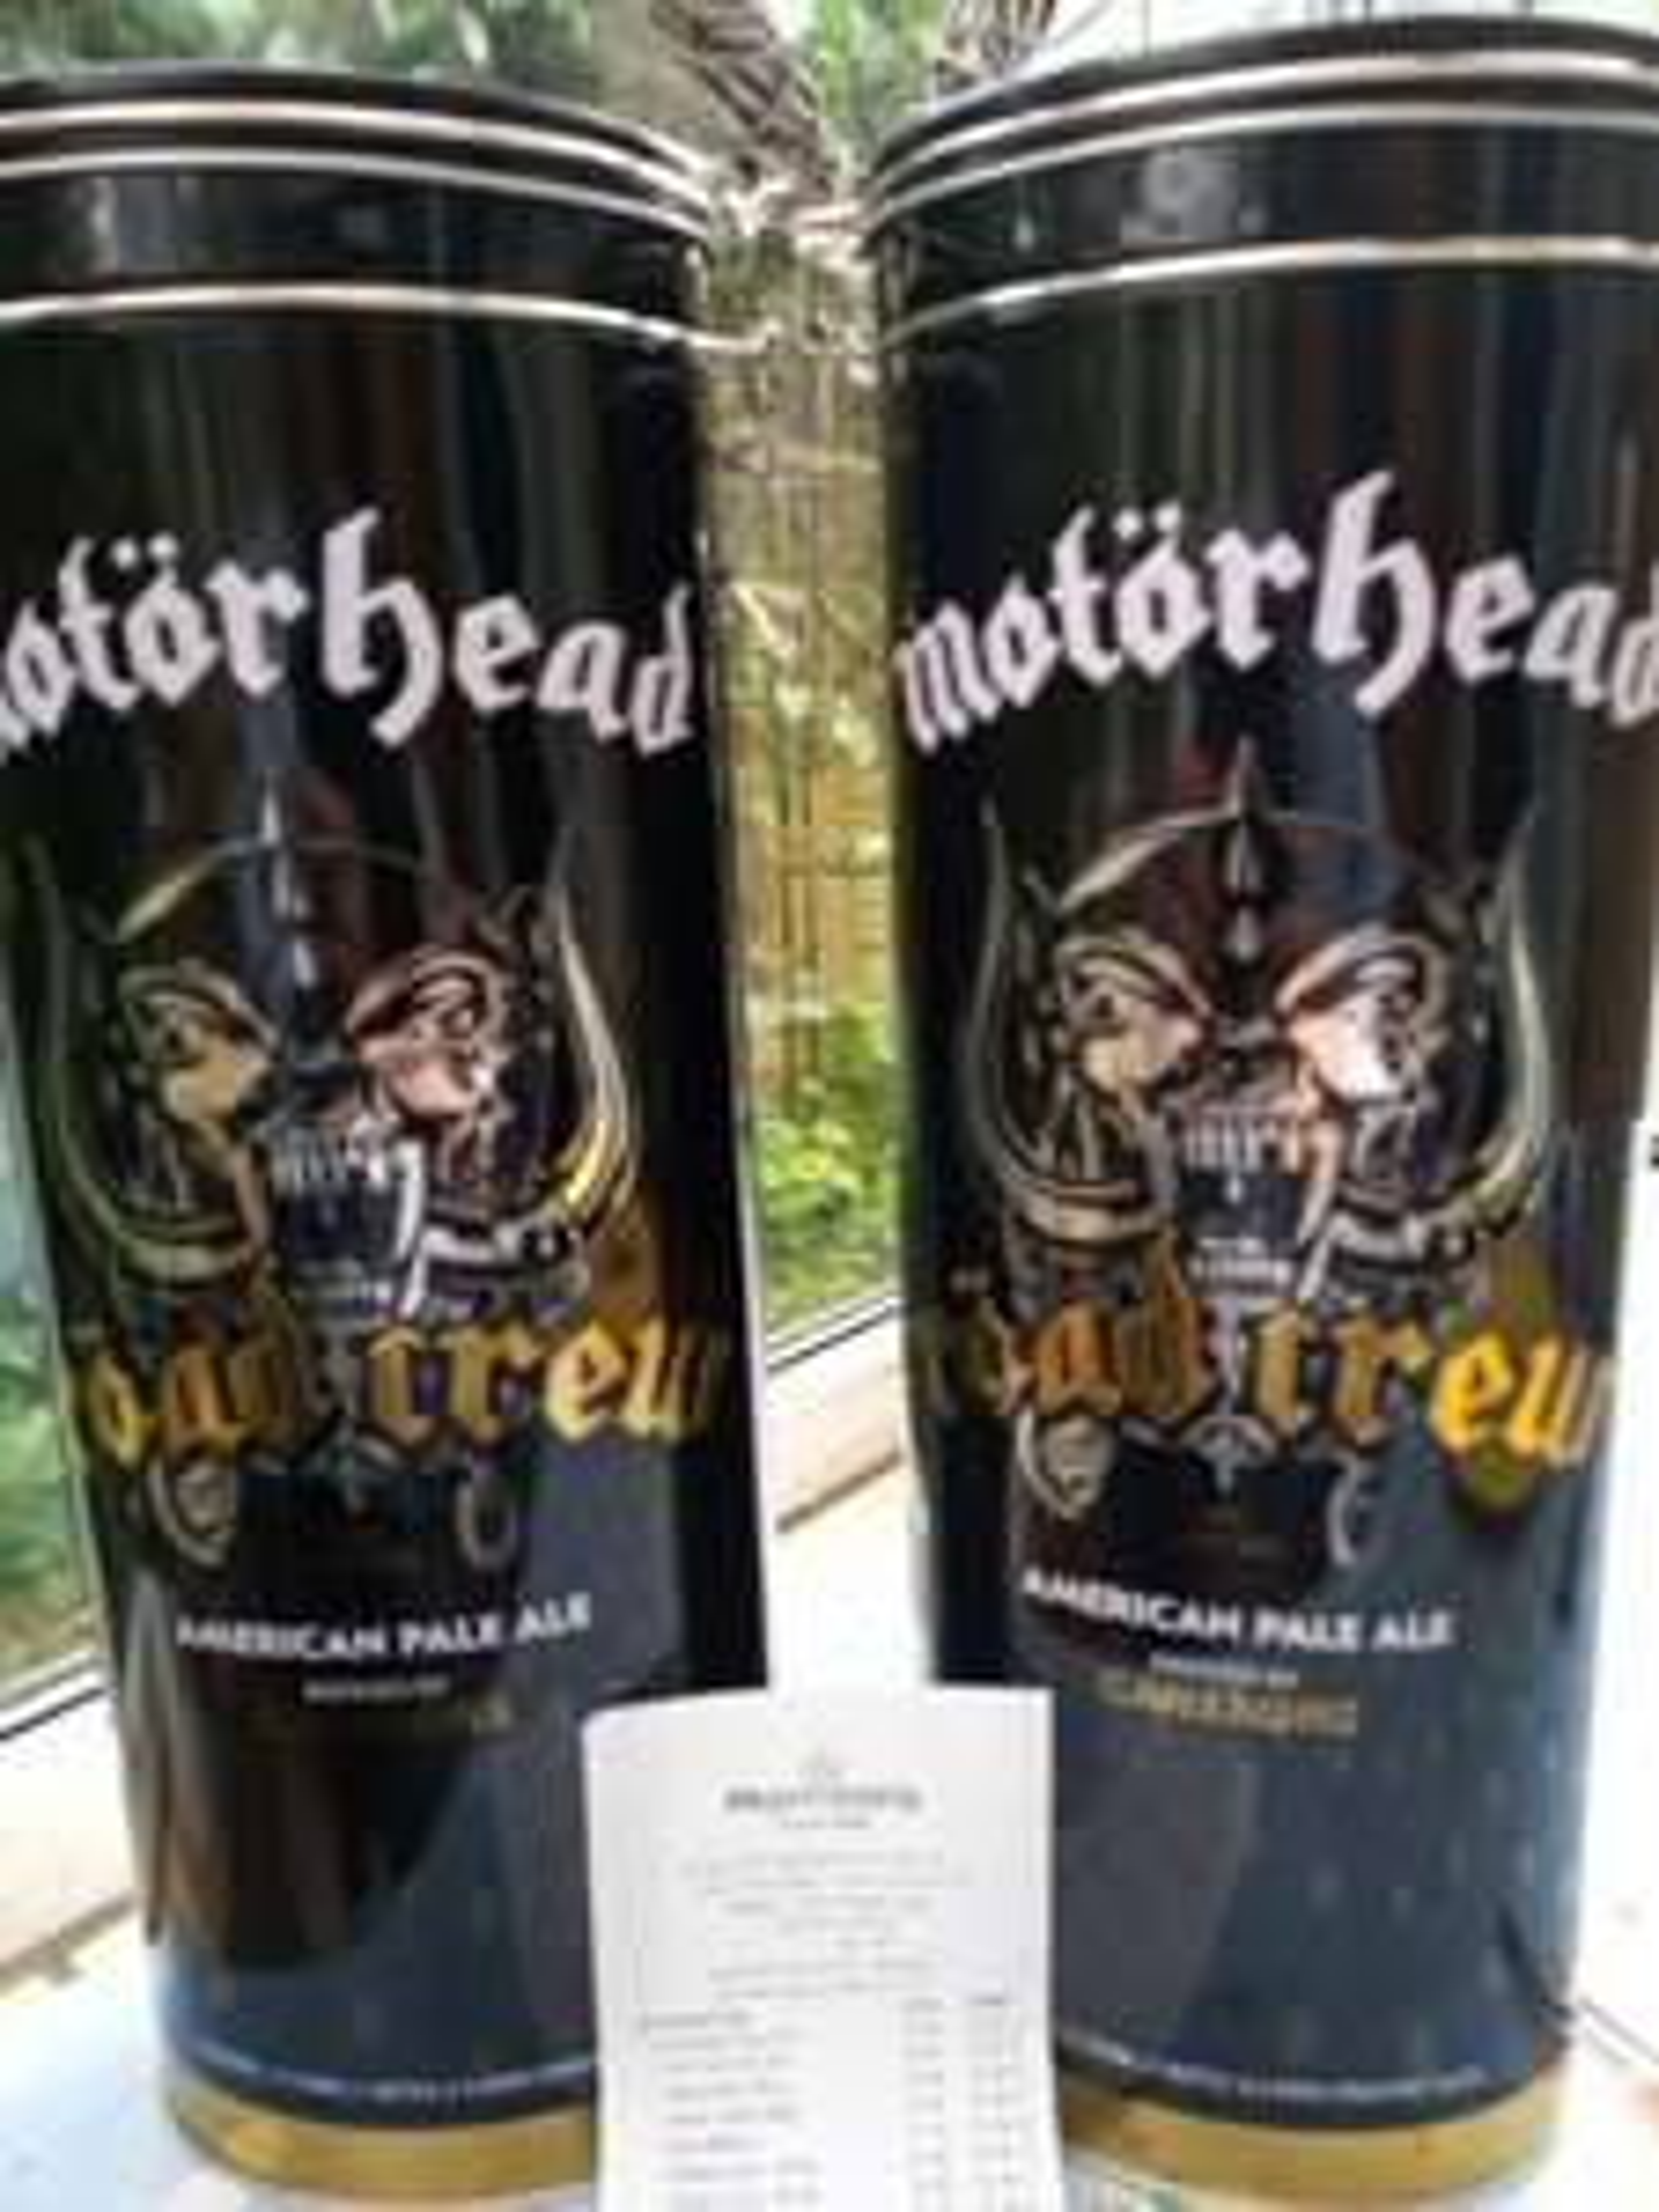 Motörhead Road Crew bottle and Road crew pint glass gift set £2 at Morrisons Gloucester